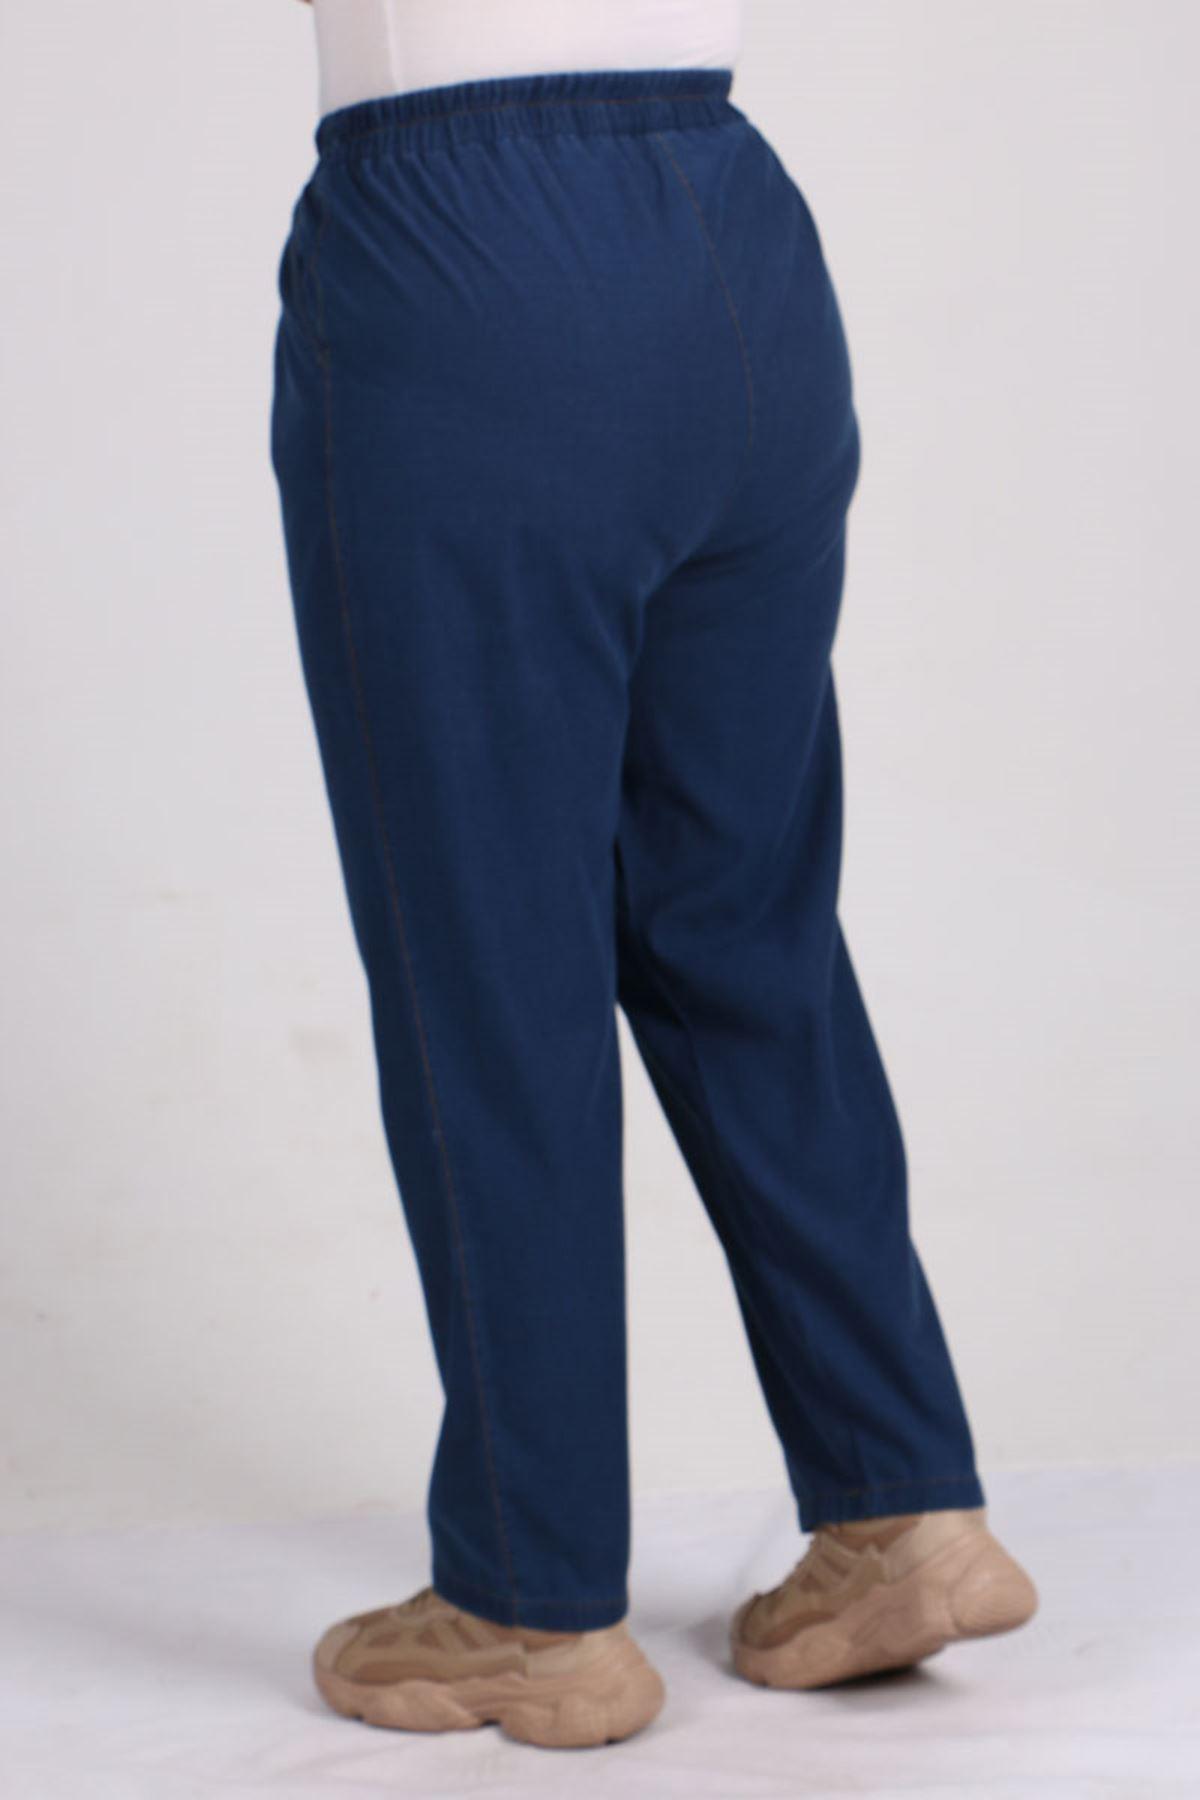 9154 Büyük Beden Beli Lastikli Dar Paça Kot Pantolon - Koyu Mavi